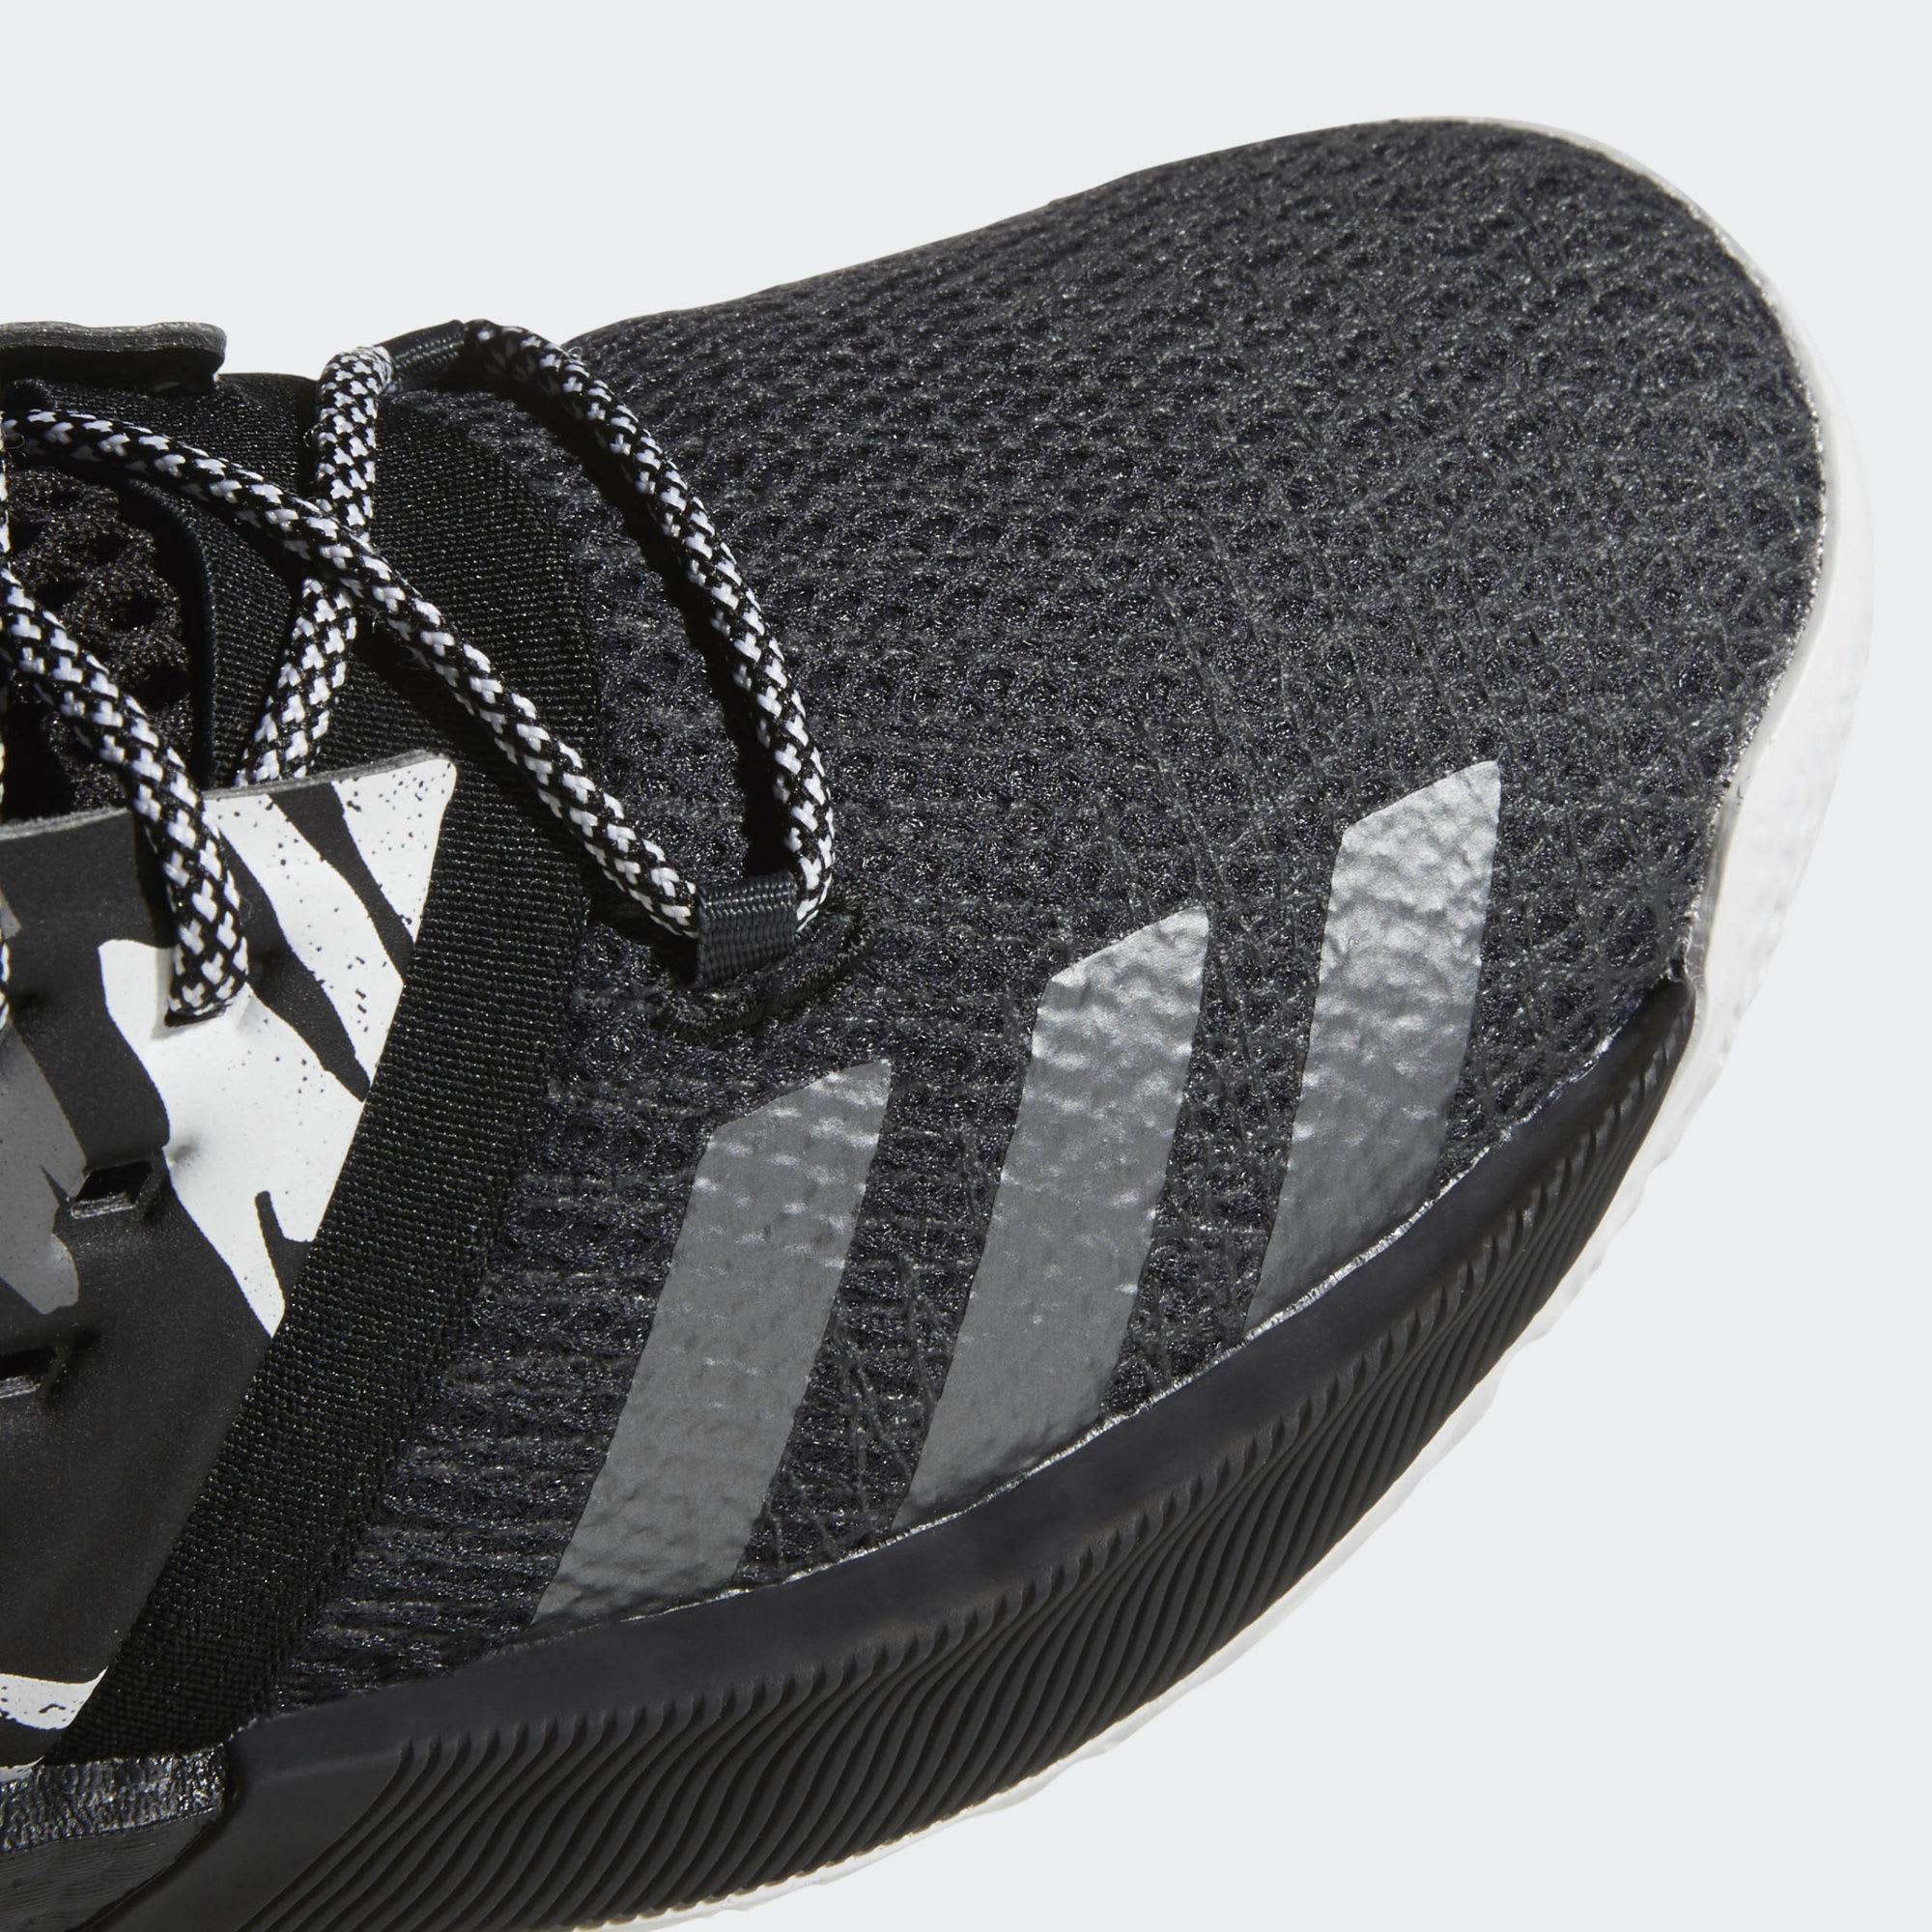 Adidas Harden Vol. 2 Traffic Jam Release Date AH2217 Toe